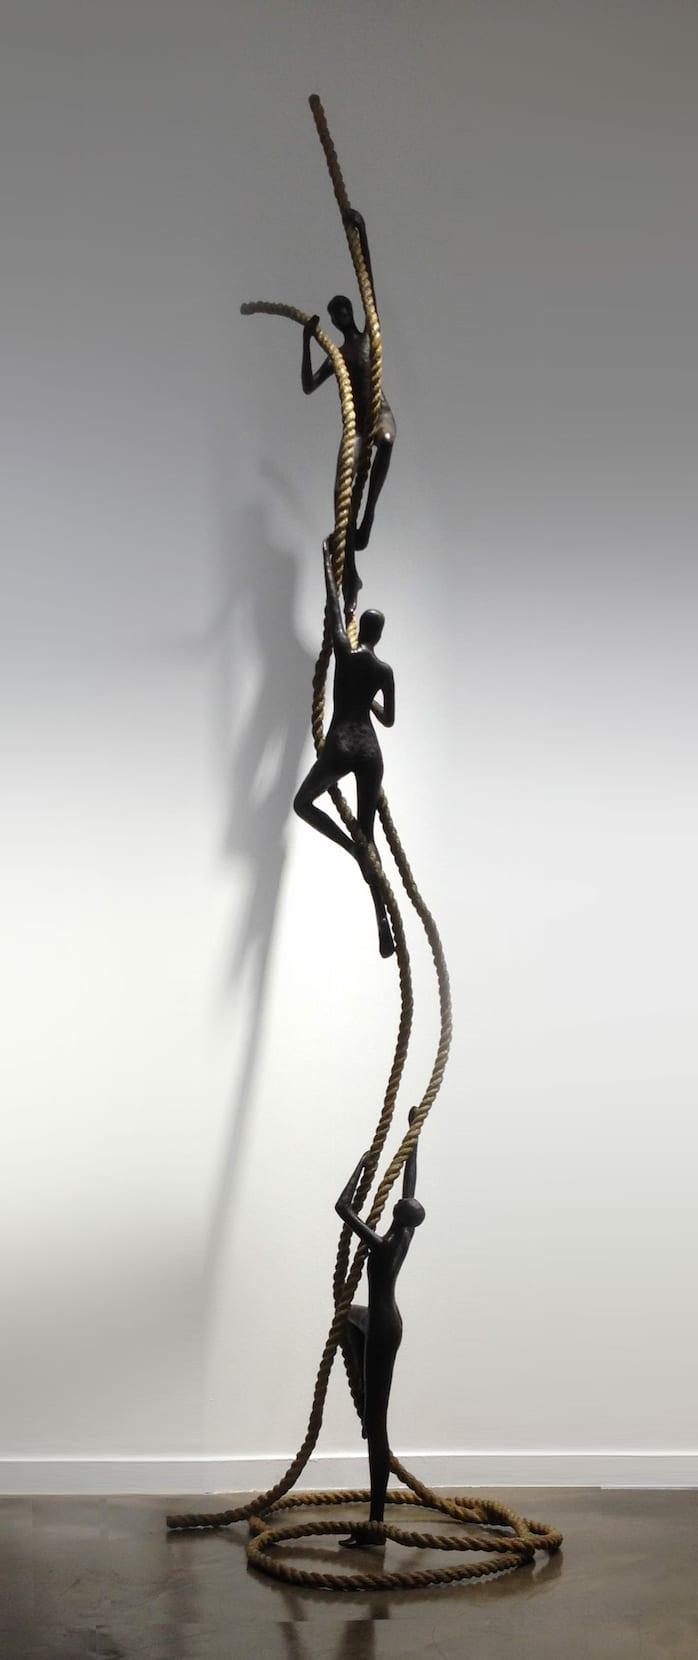 ENCOURAGEMENT Bronze 310x75x85cm /122x29,5x33,4 inches